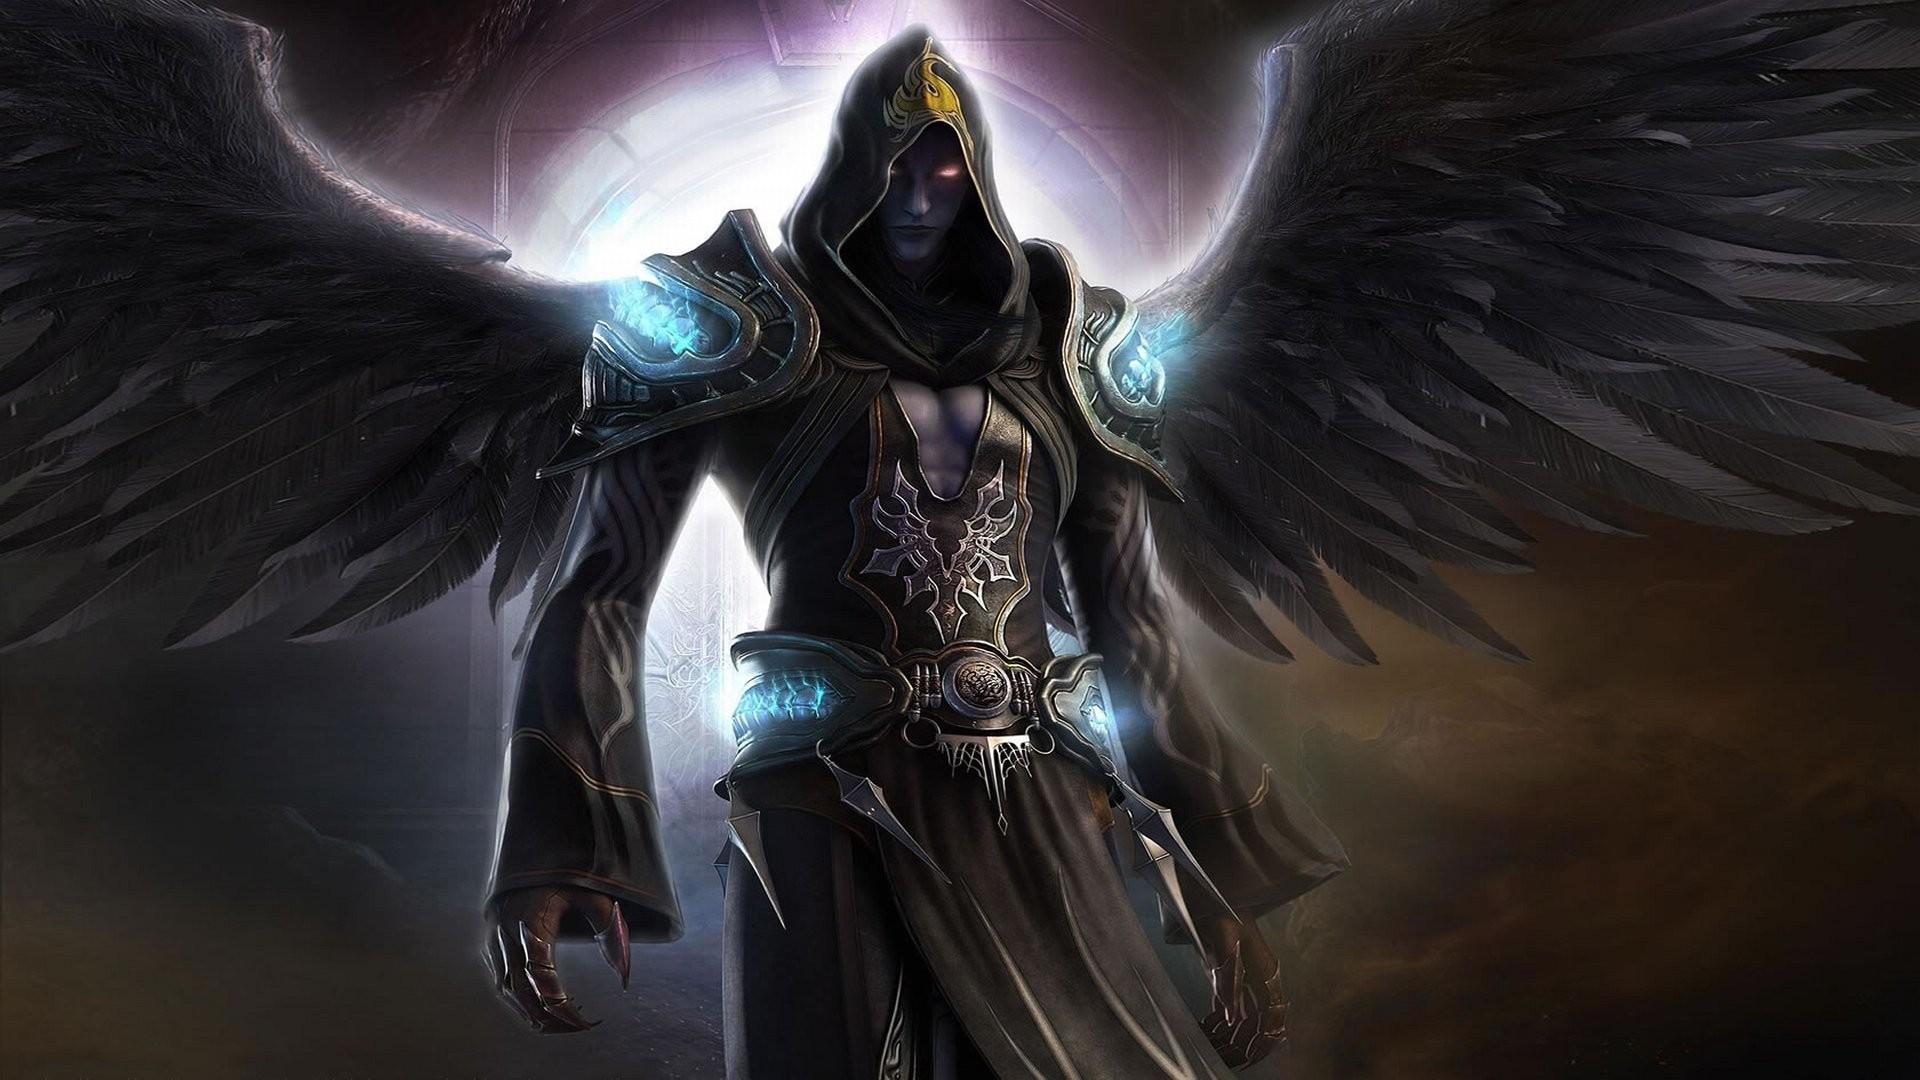 Wallpaper black angel dark